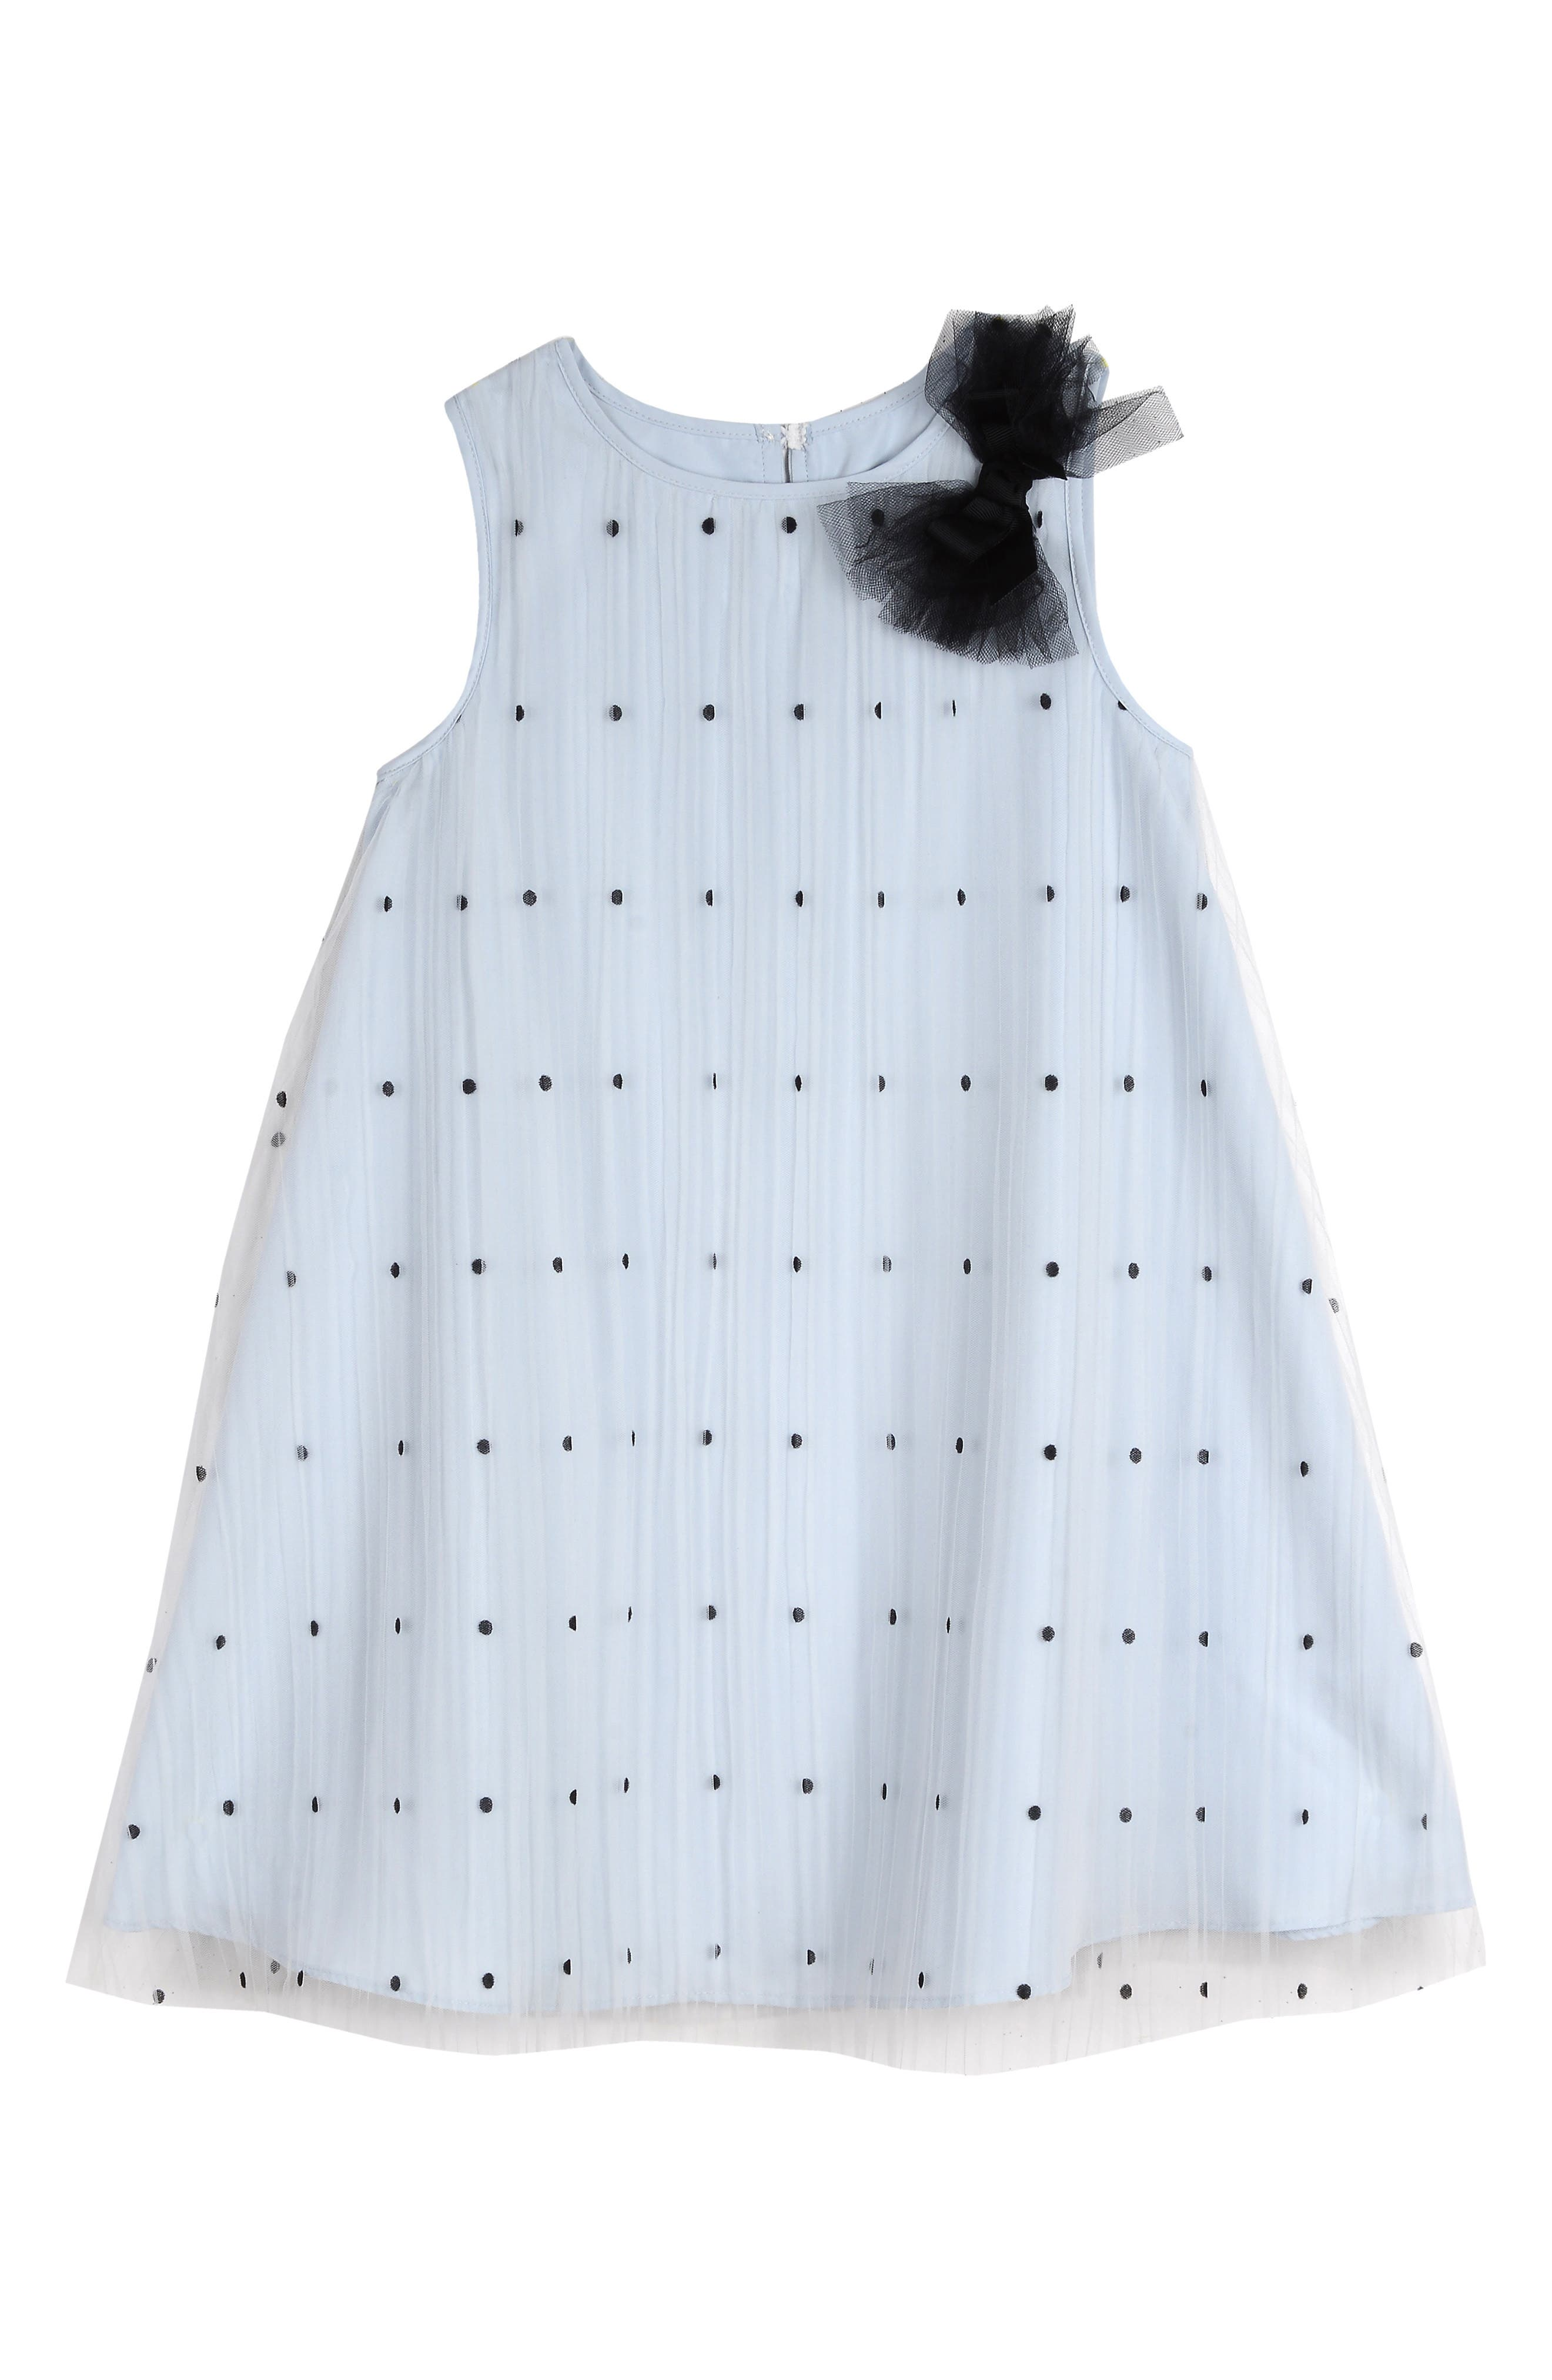 PIPPA & JULIE, Polka Dot Tulle Shift Dress, Main thumbnail 1, color, BLUE/ BLACK